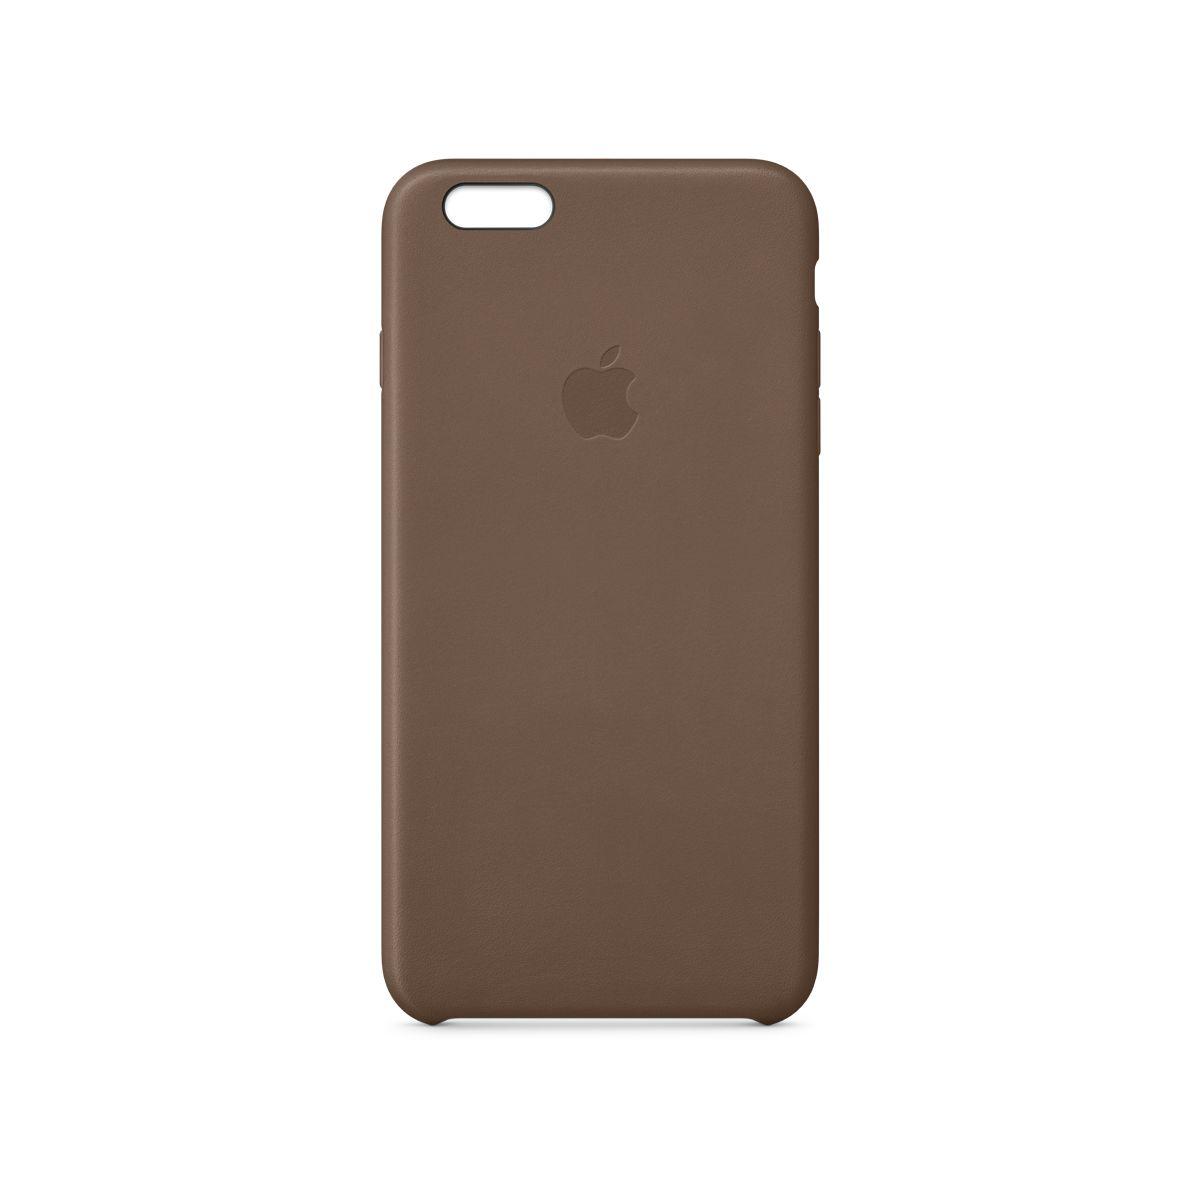 Coque APPLE iPhone 6 Plus brun olive cuir (photo)